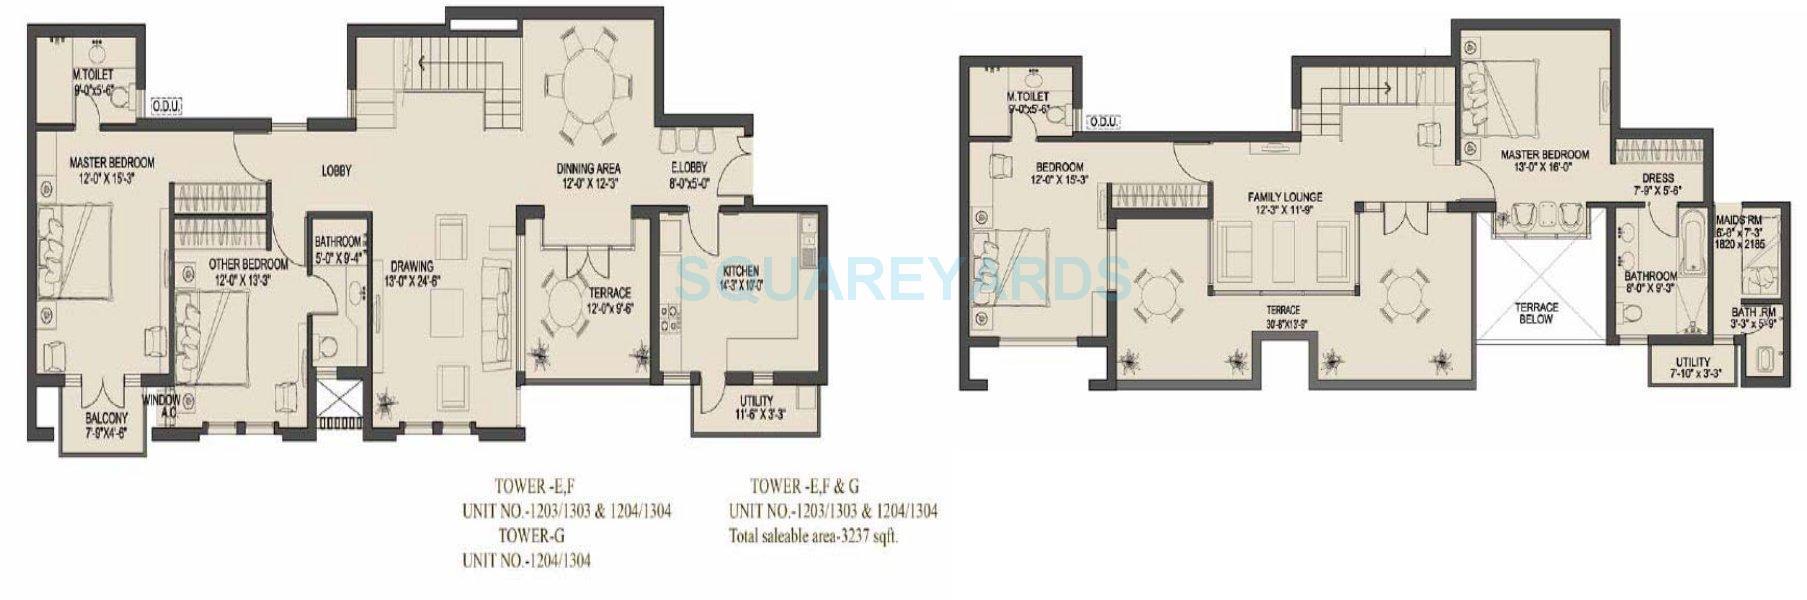 uppals canary homes apartment 4bhk sq 3237sqft 1